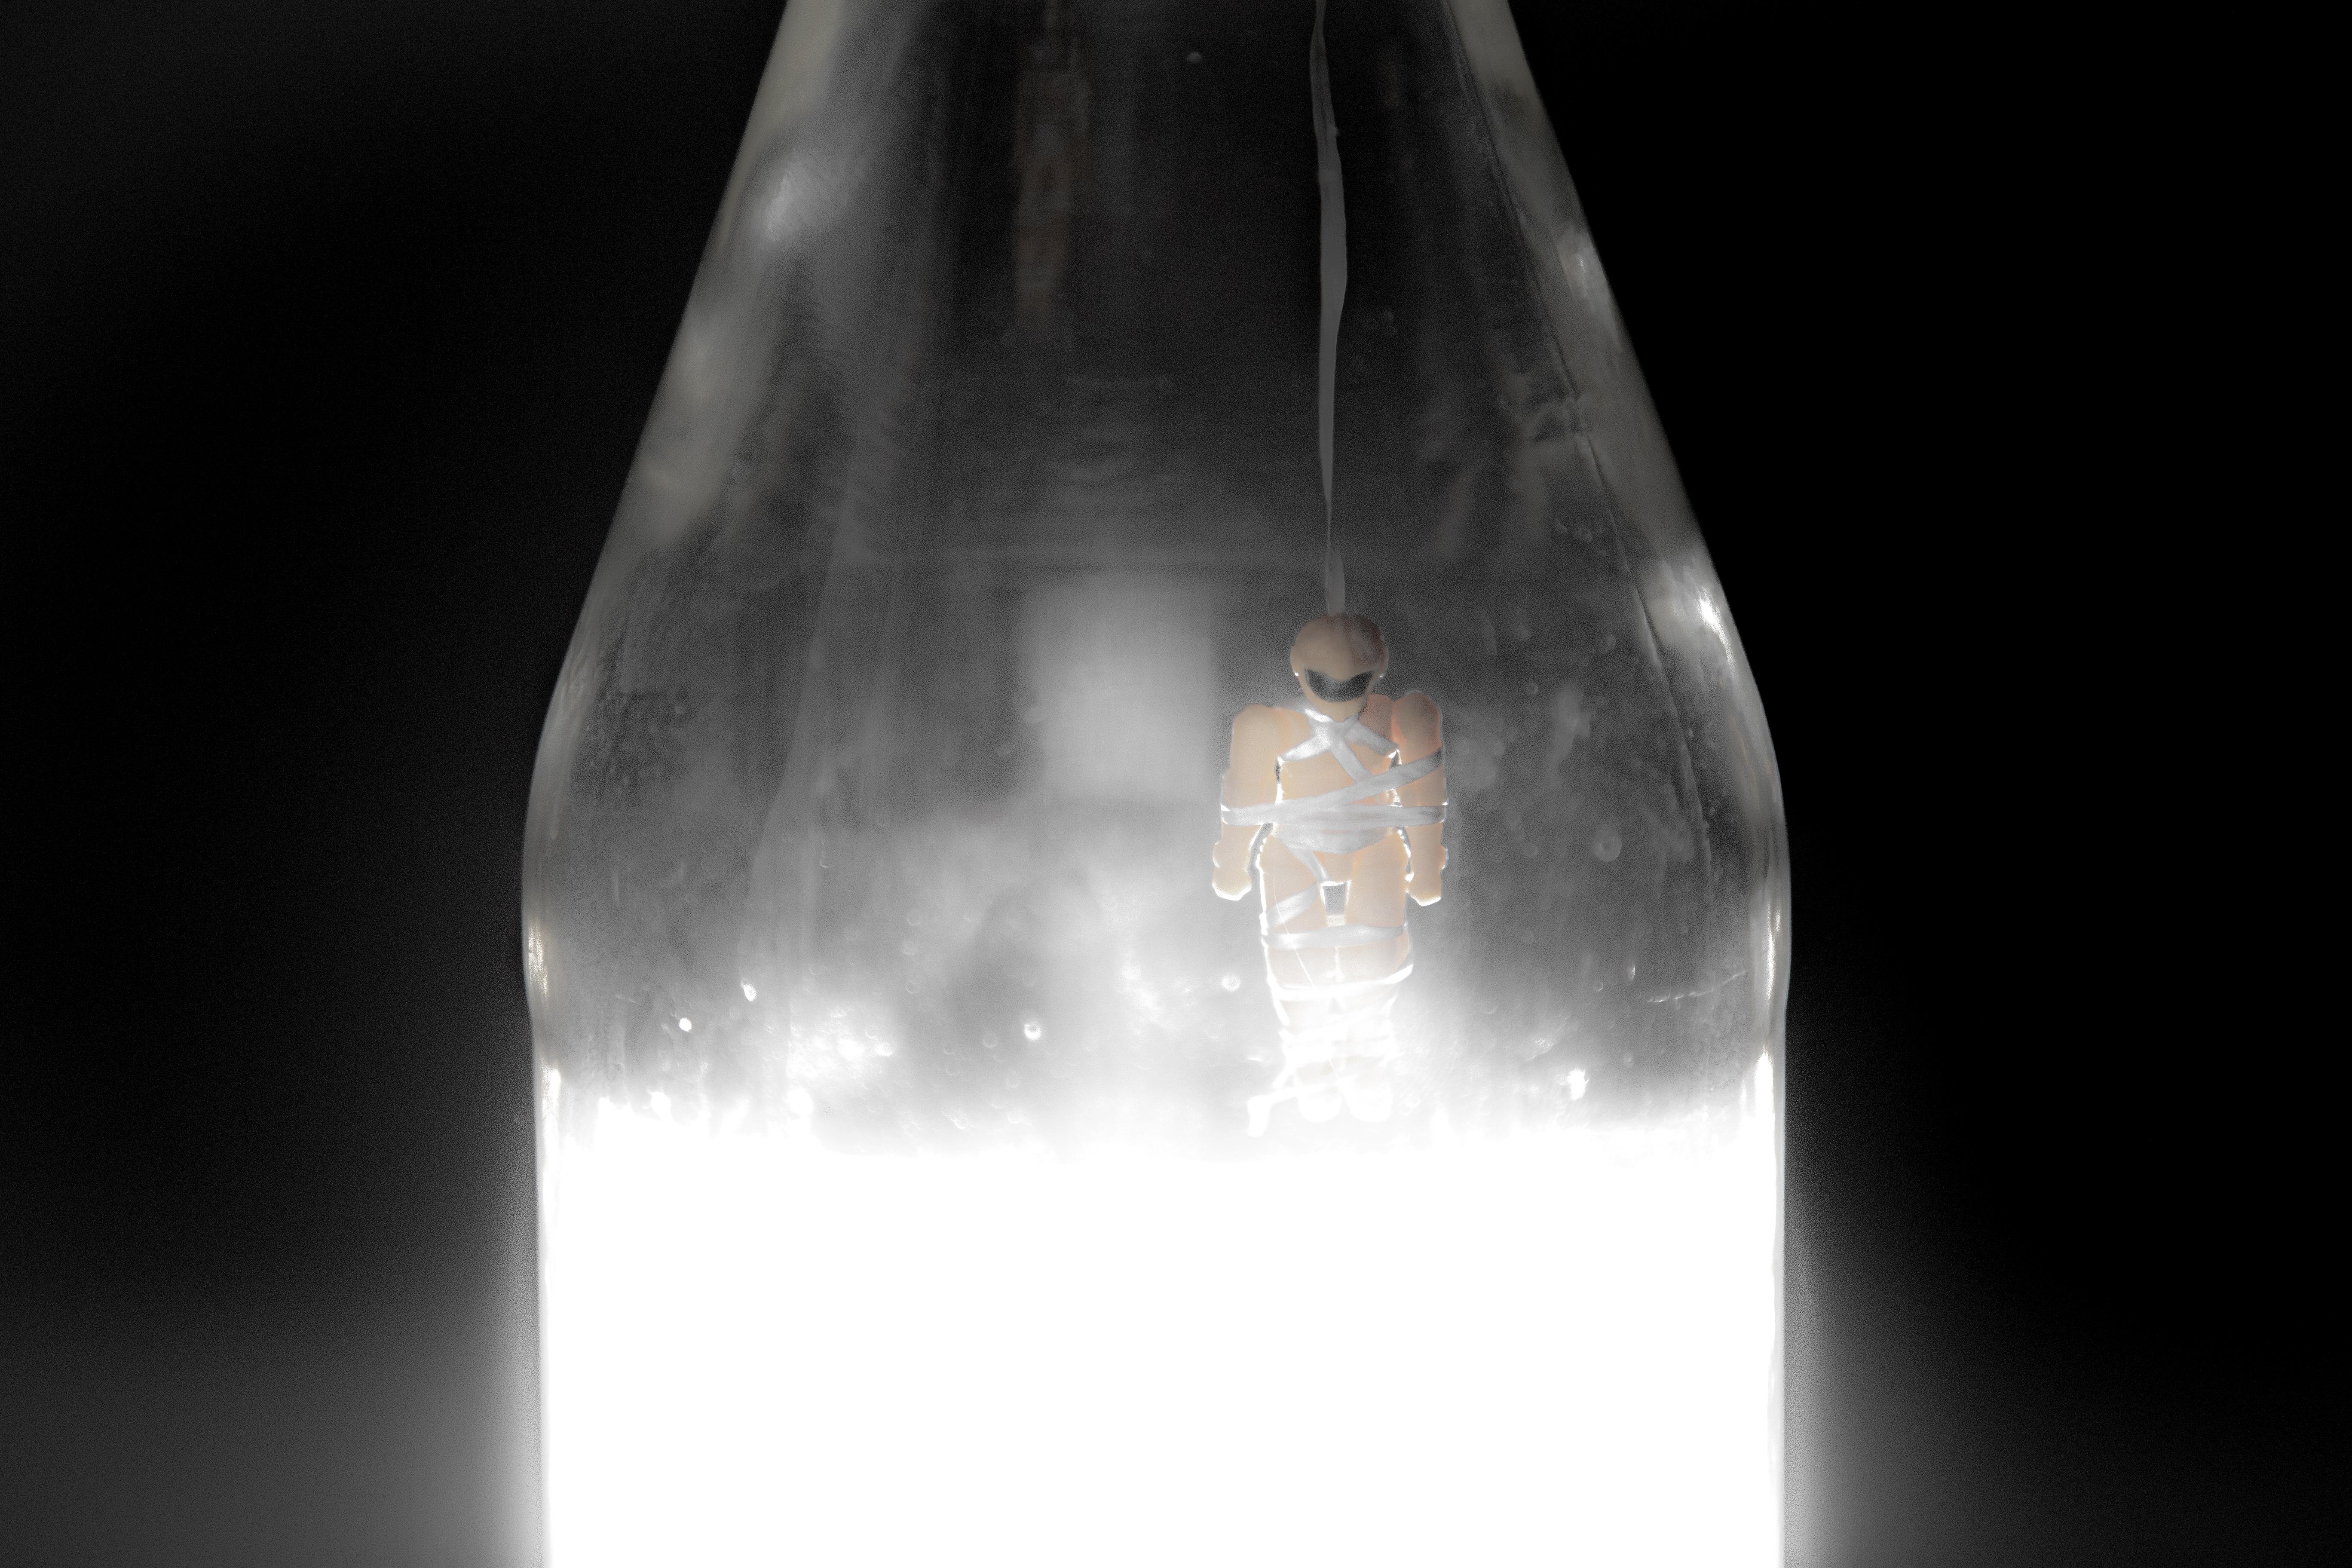 BottledHumanity-38